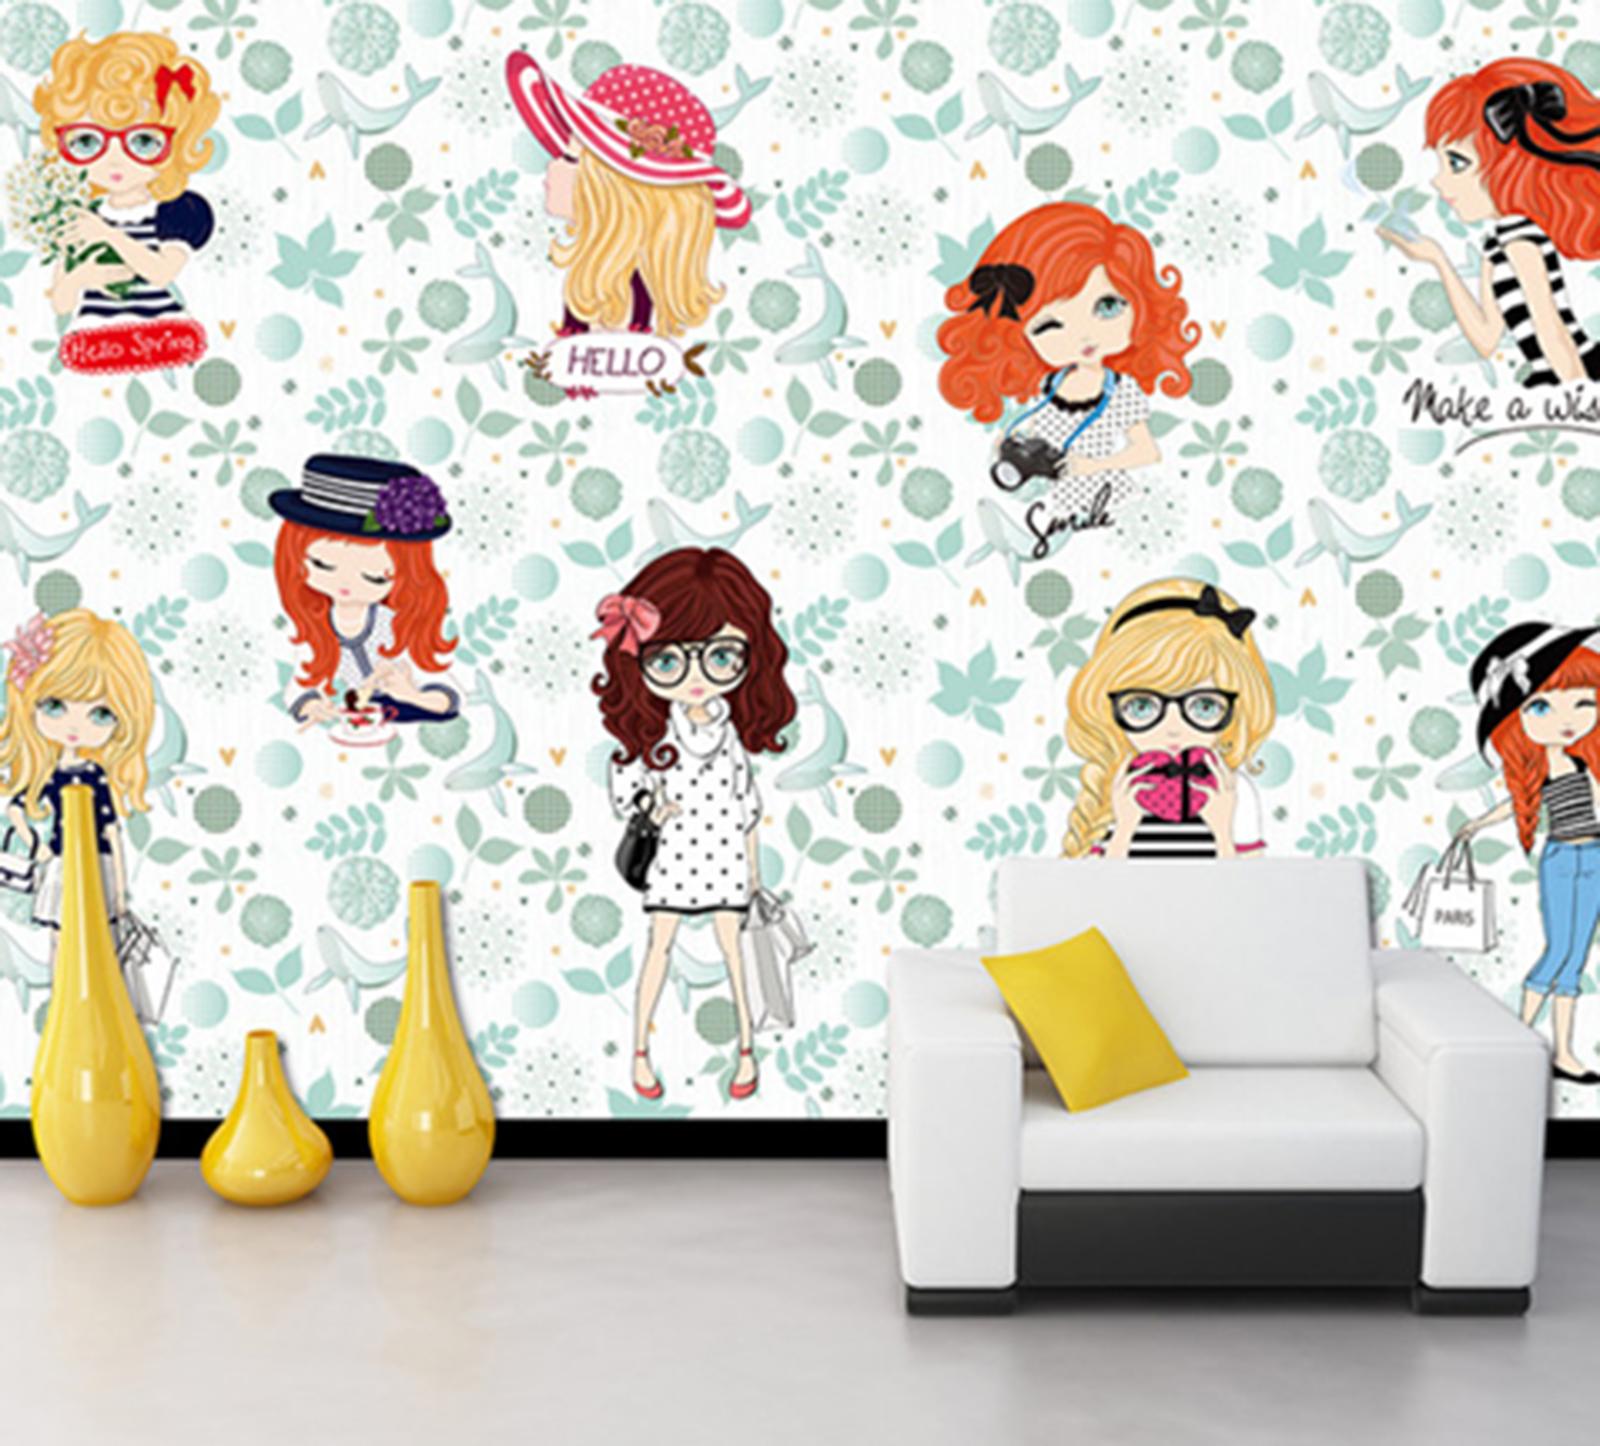 3D Girls Paint 575 Wallpaper Murals Wall Print Wallpaper Mural AJ WALL AU Kyra